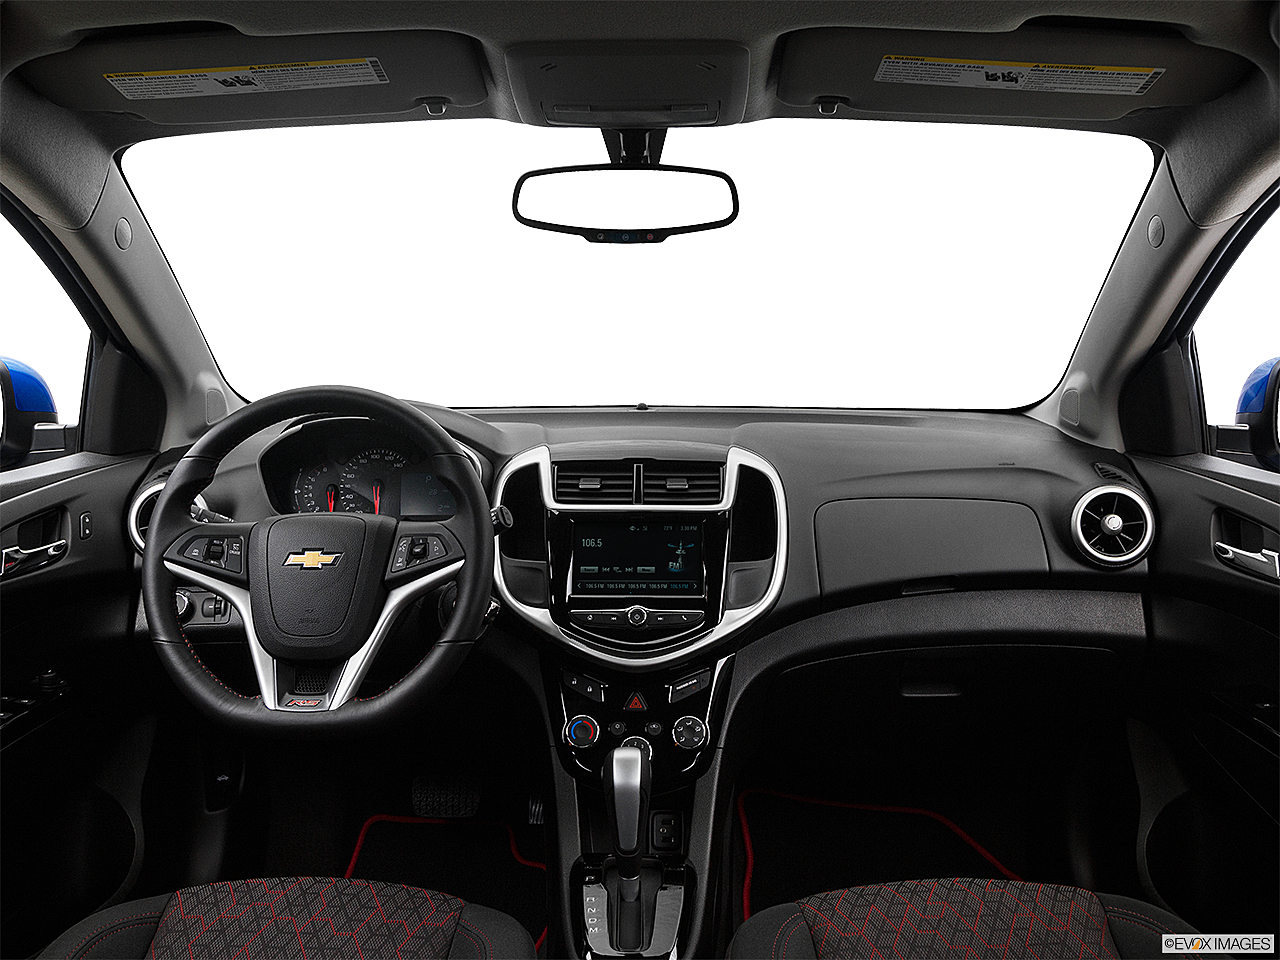 2017 Chevrolet Sonic Premier Manual 4dr Hatchback Research Groovecar